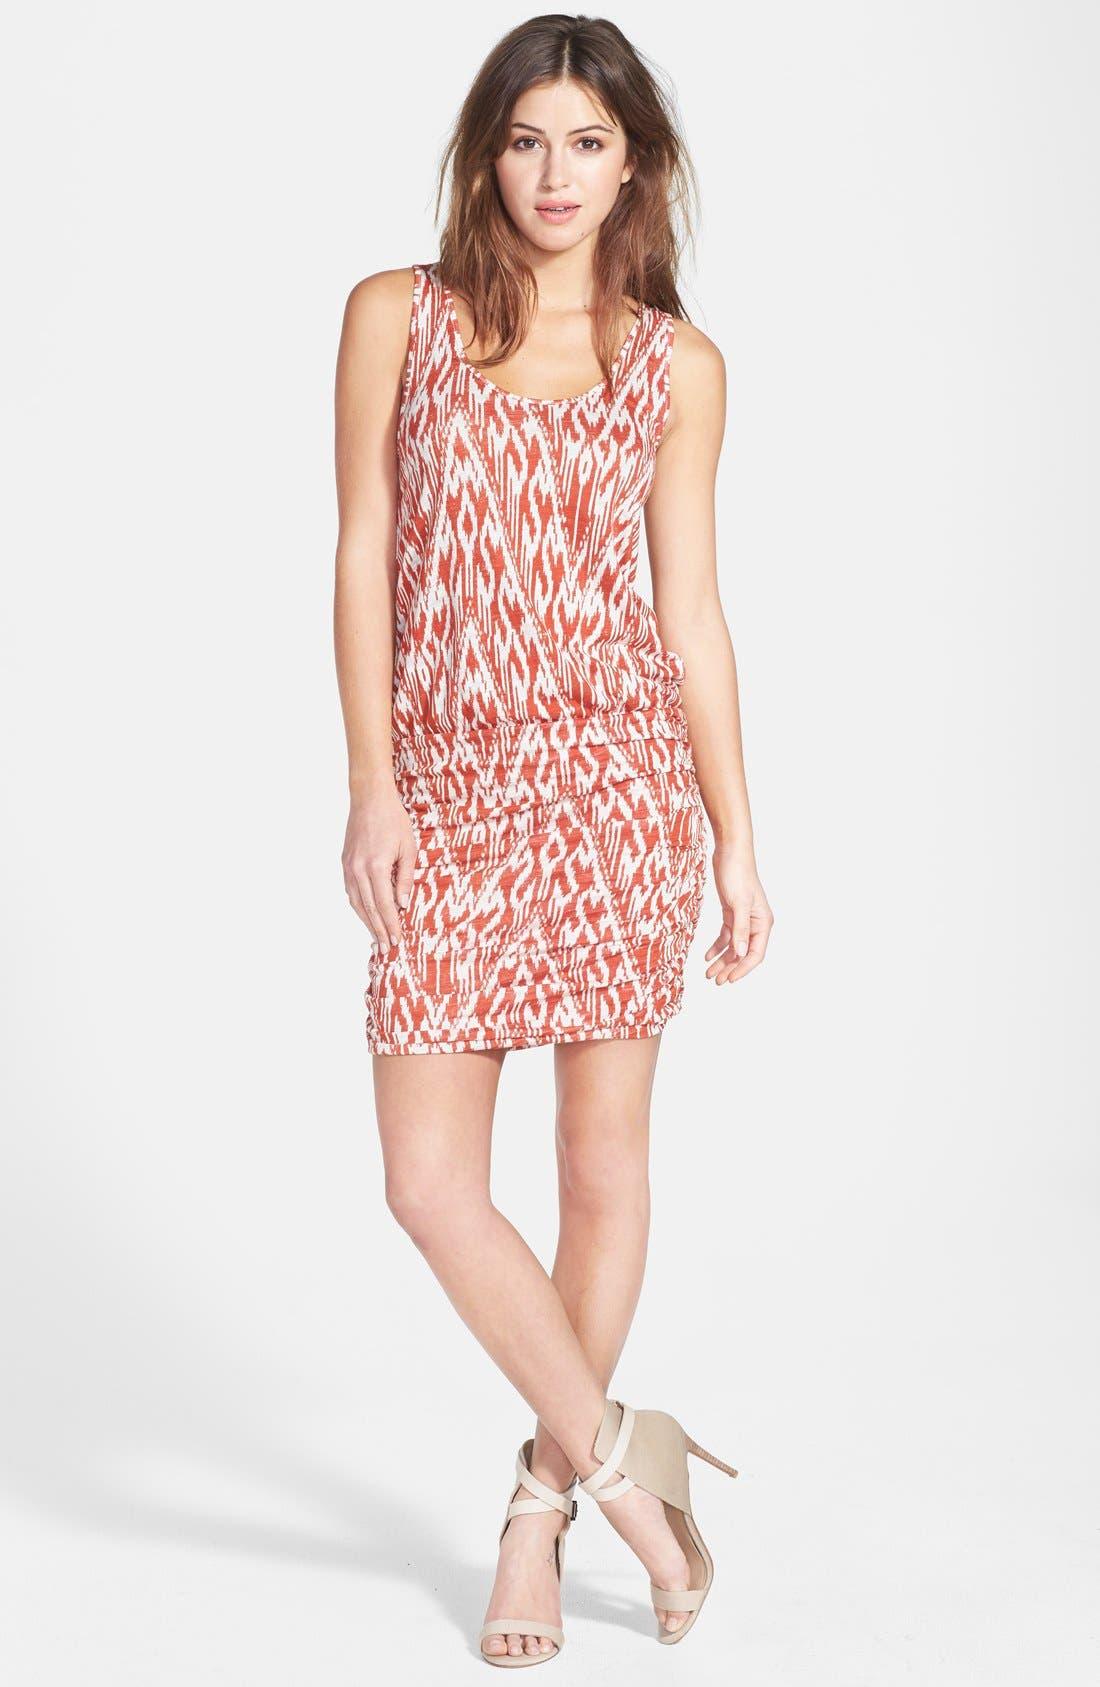 Main Image - Soft Joie Print Ruched Skirt Minidress